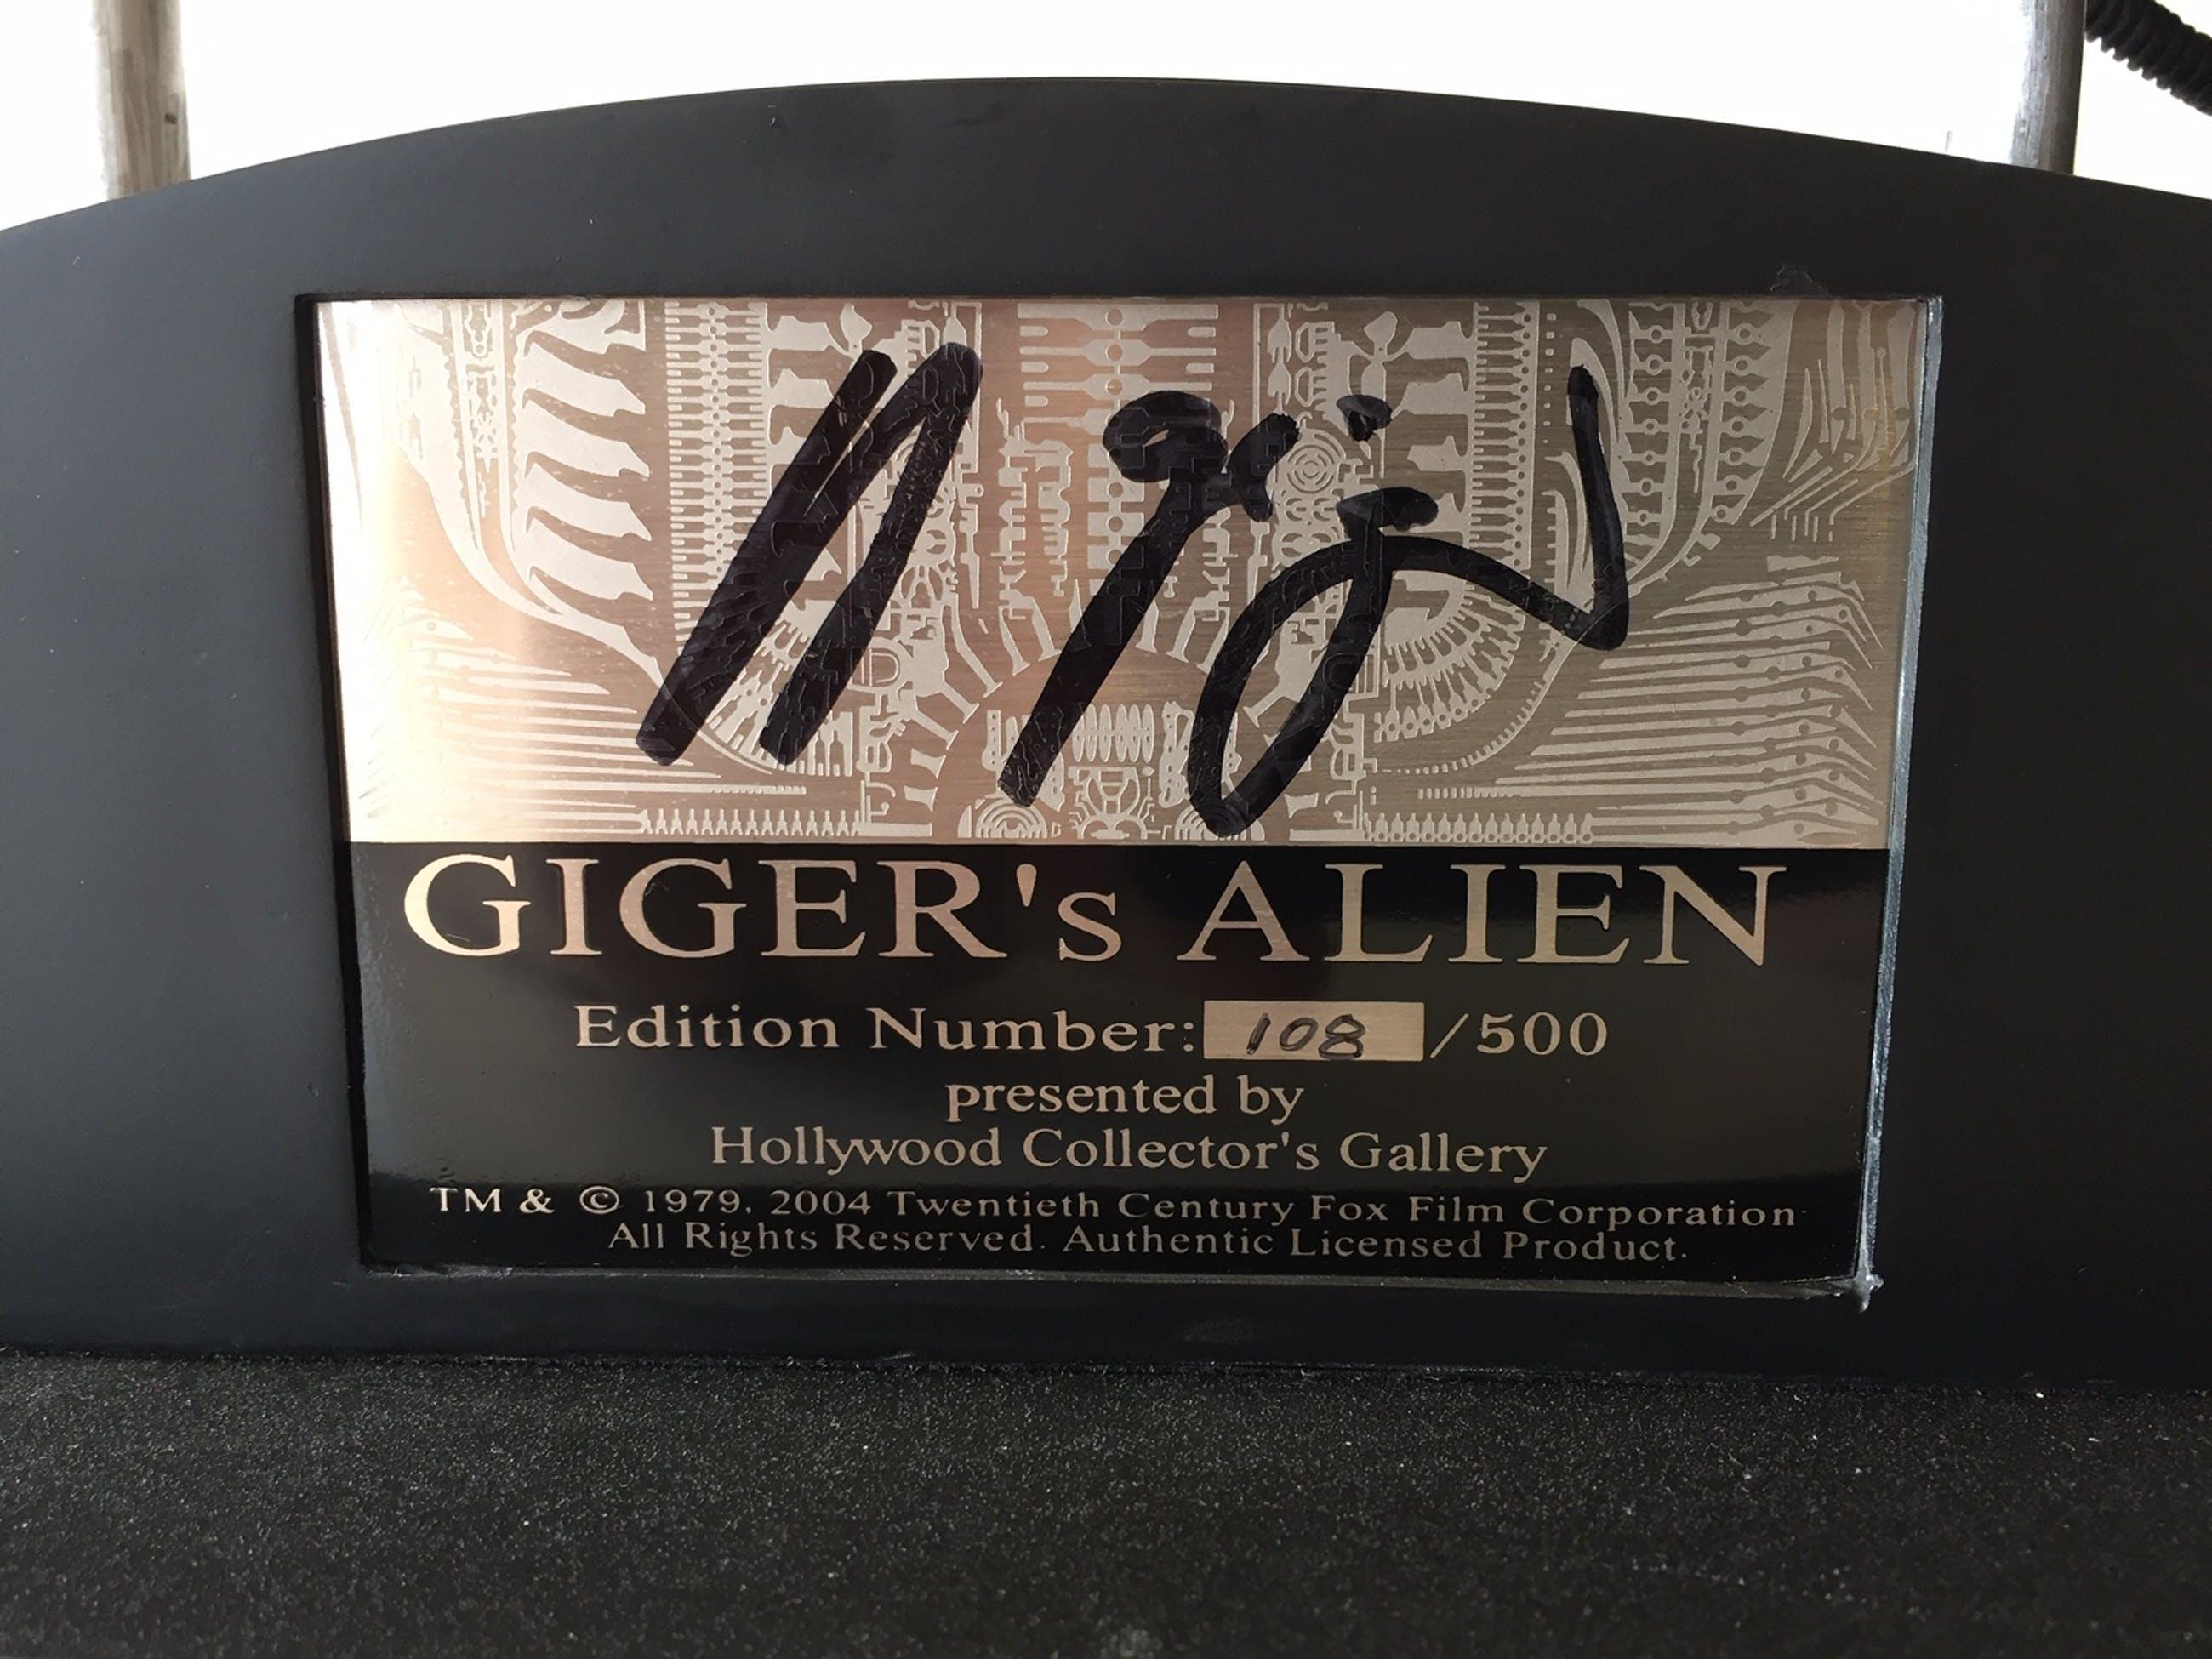 Hans Rudolf Giger - Alien Kopf Skulptur von HR Giger handsigniert kopen? Bied vanaf 2490!